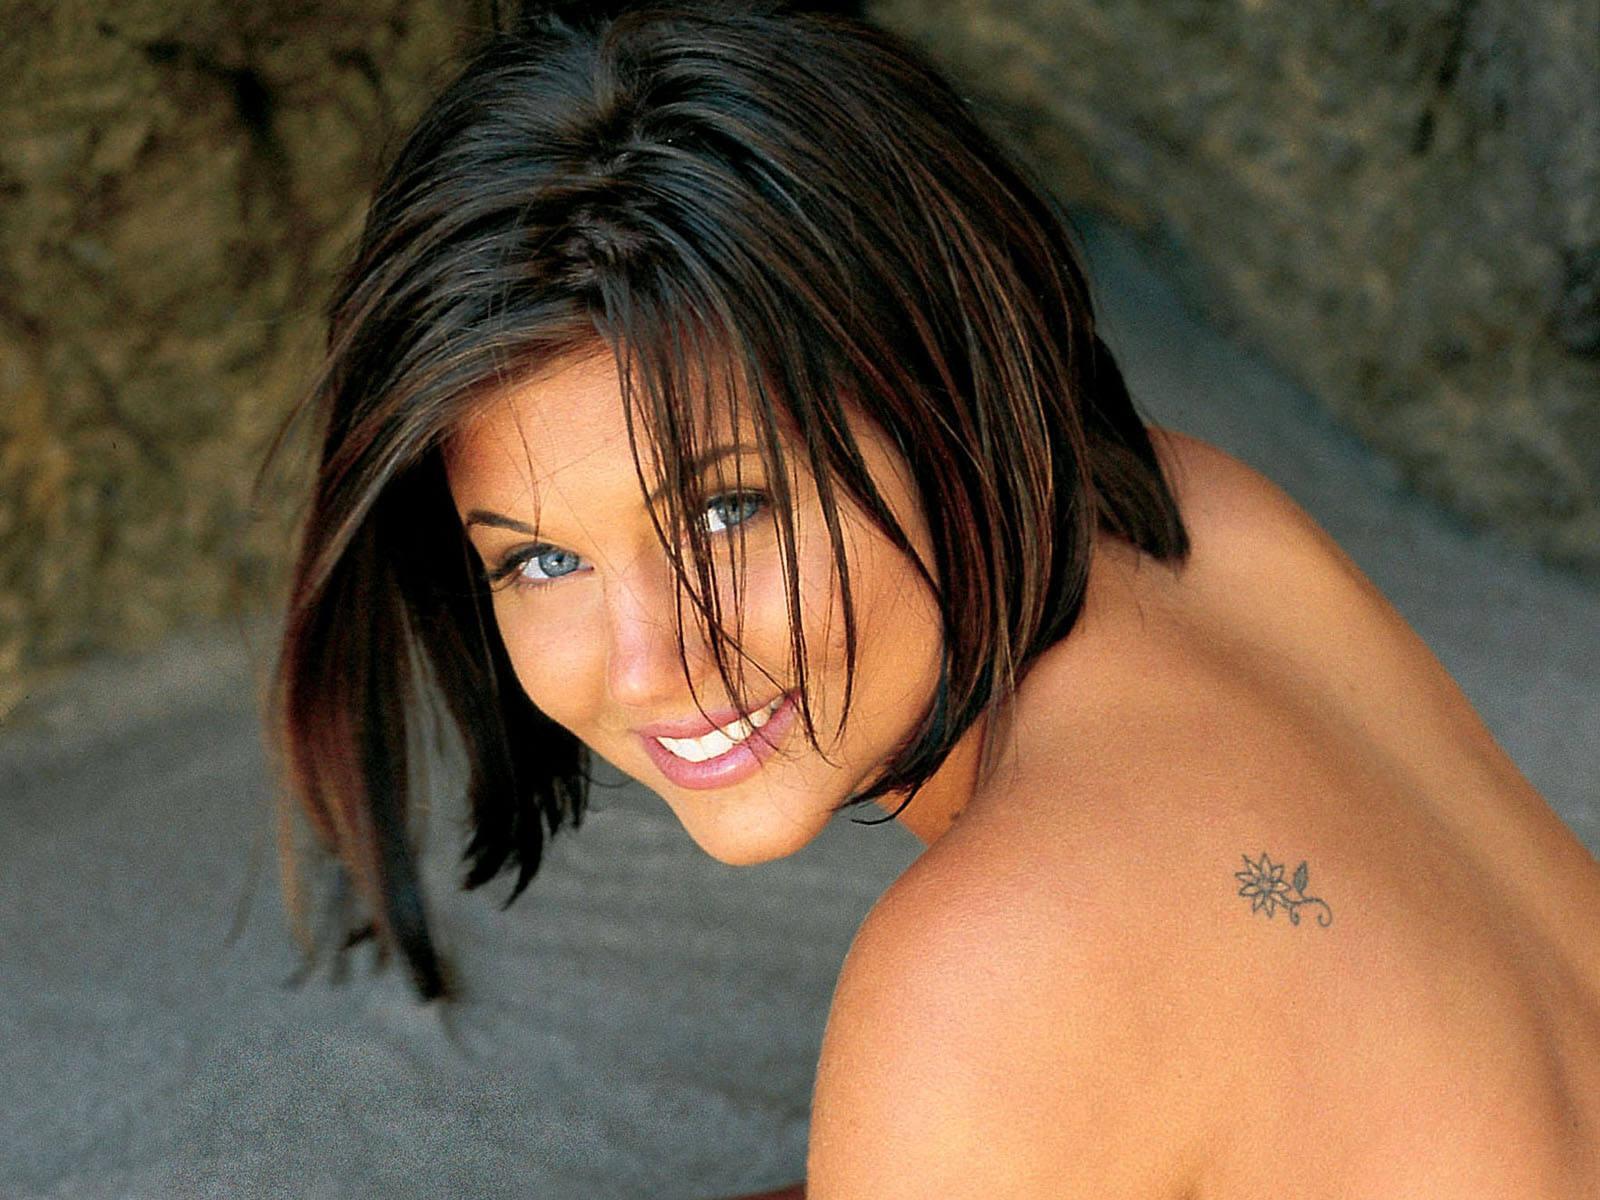 Girls embarrassed nude public canada